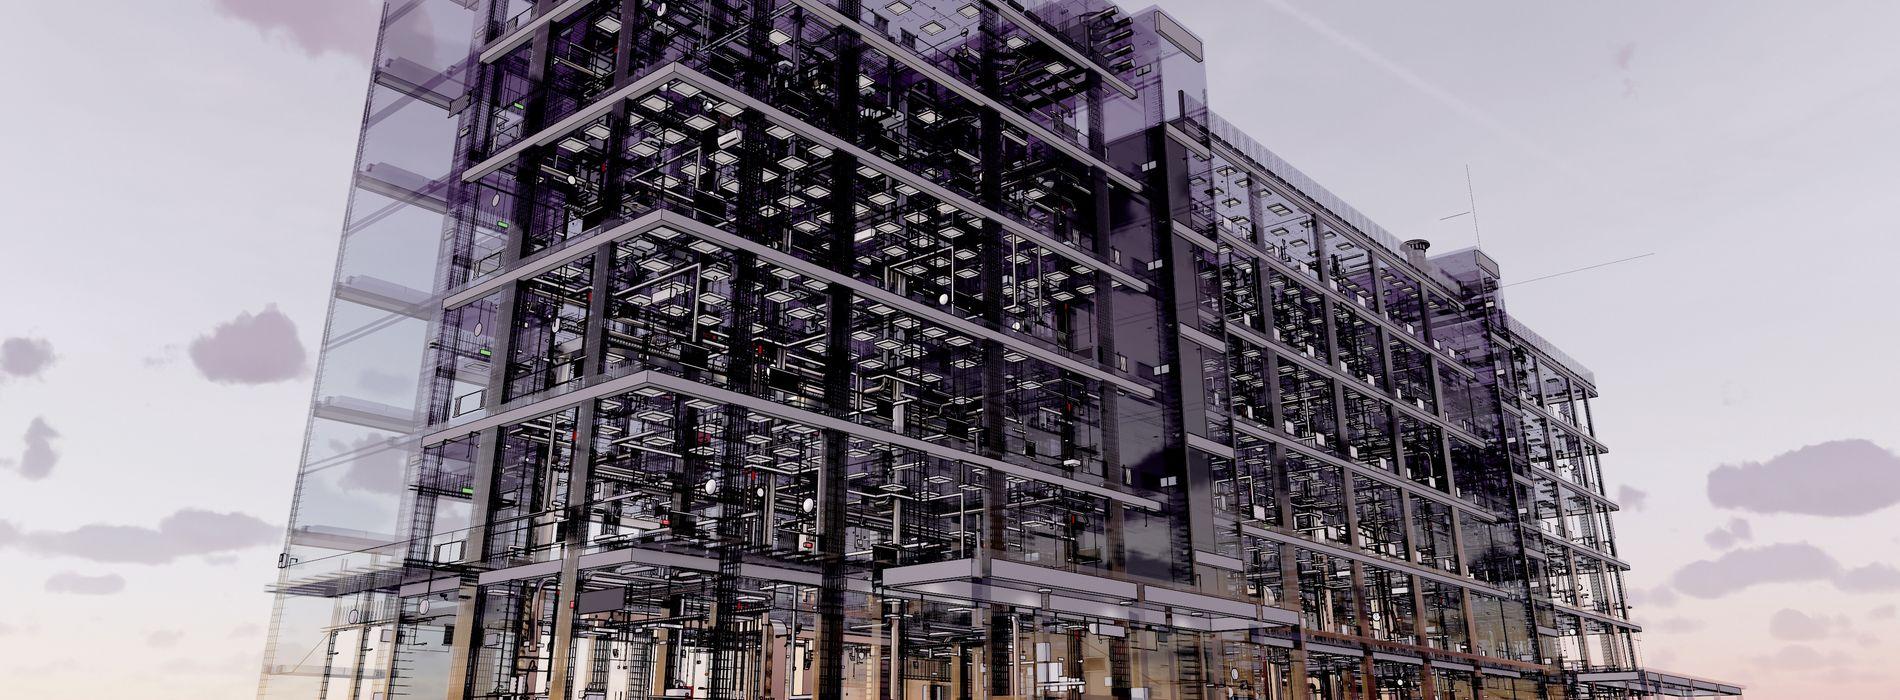 株式会社フジキ建築事務所